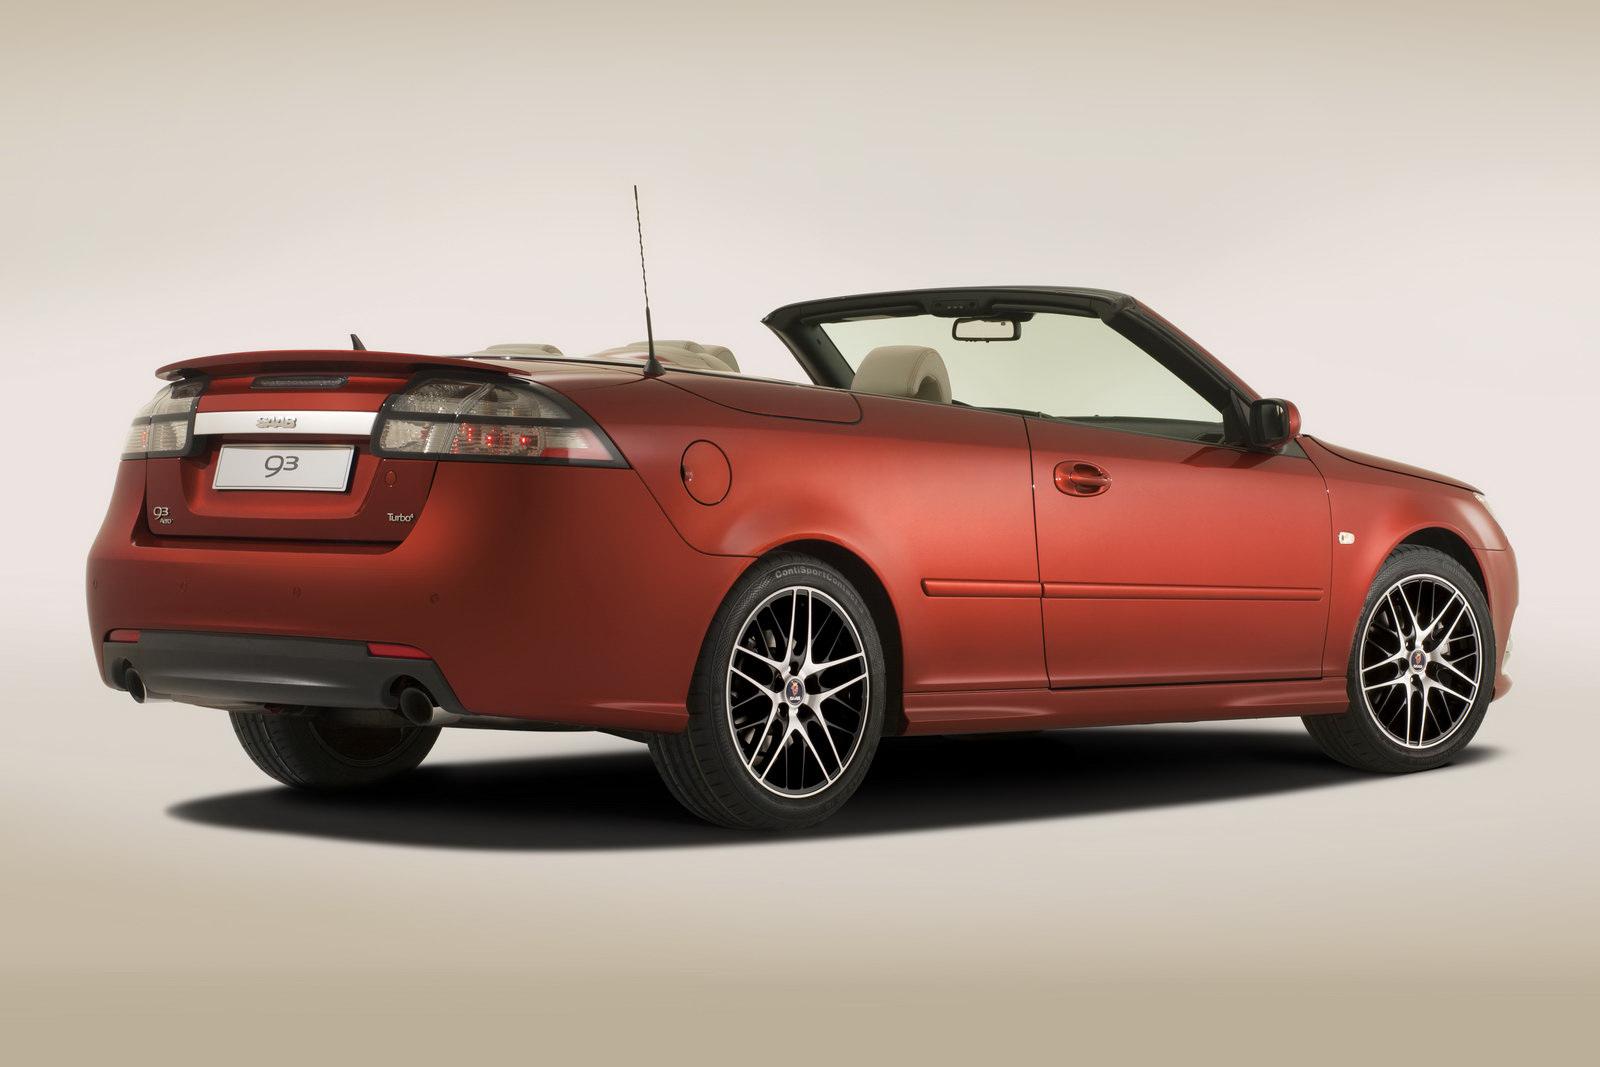 Saab 9-3 Independence Edition